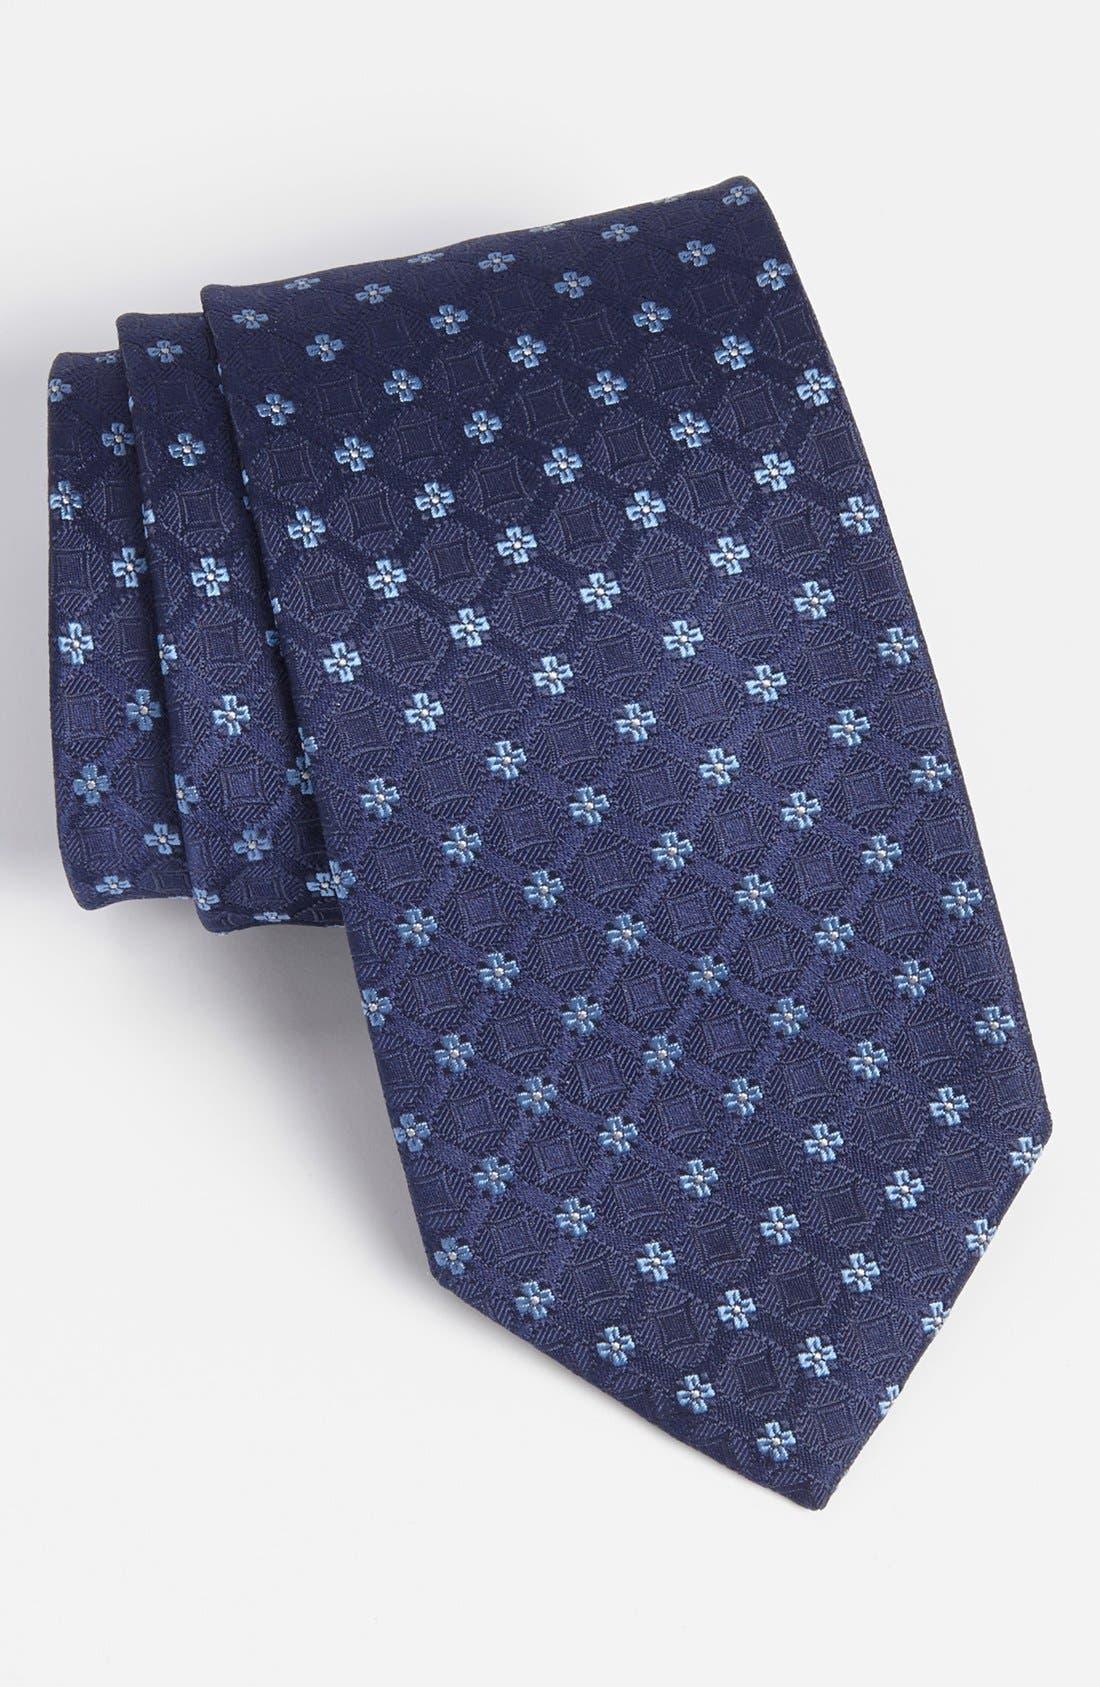 Alternate Image 1 Selected - BOSS HUGO BOSS Woven Silk Tie